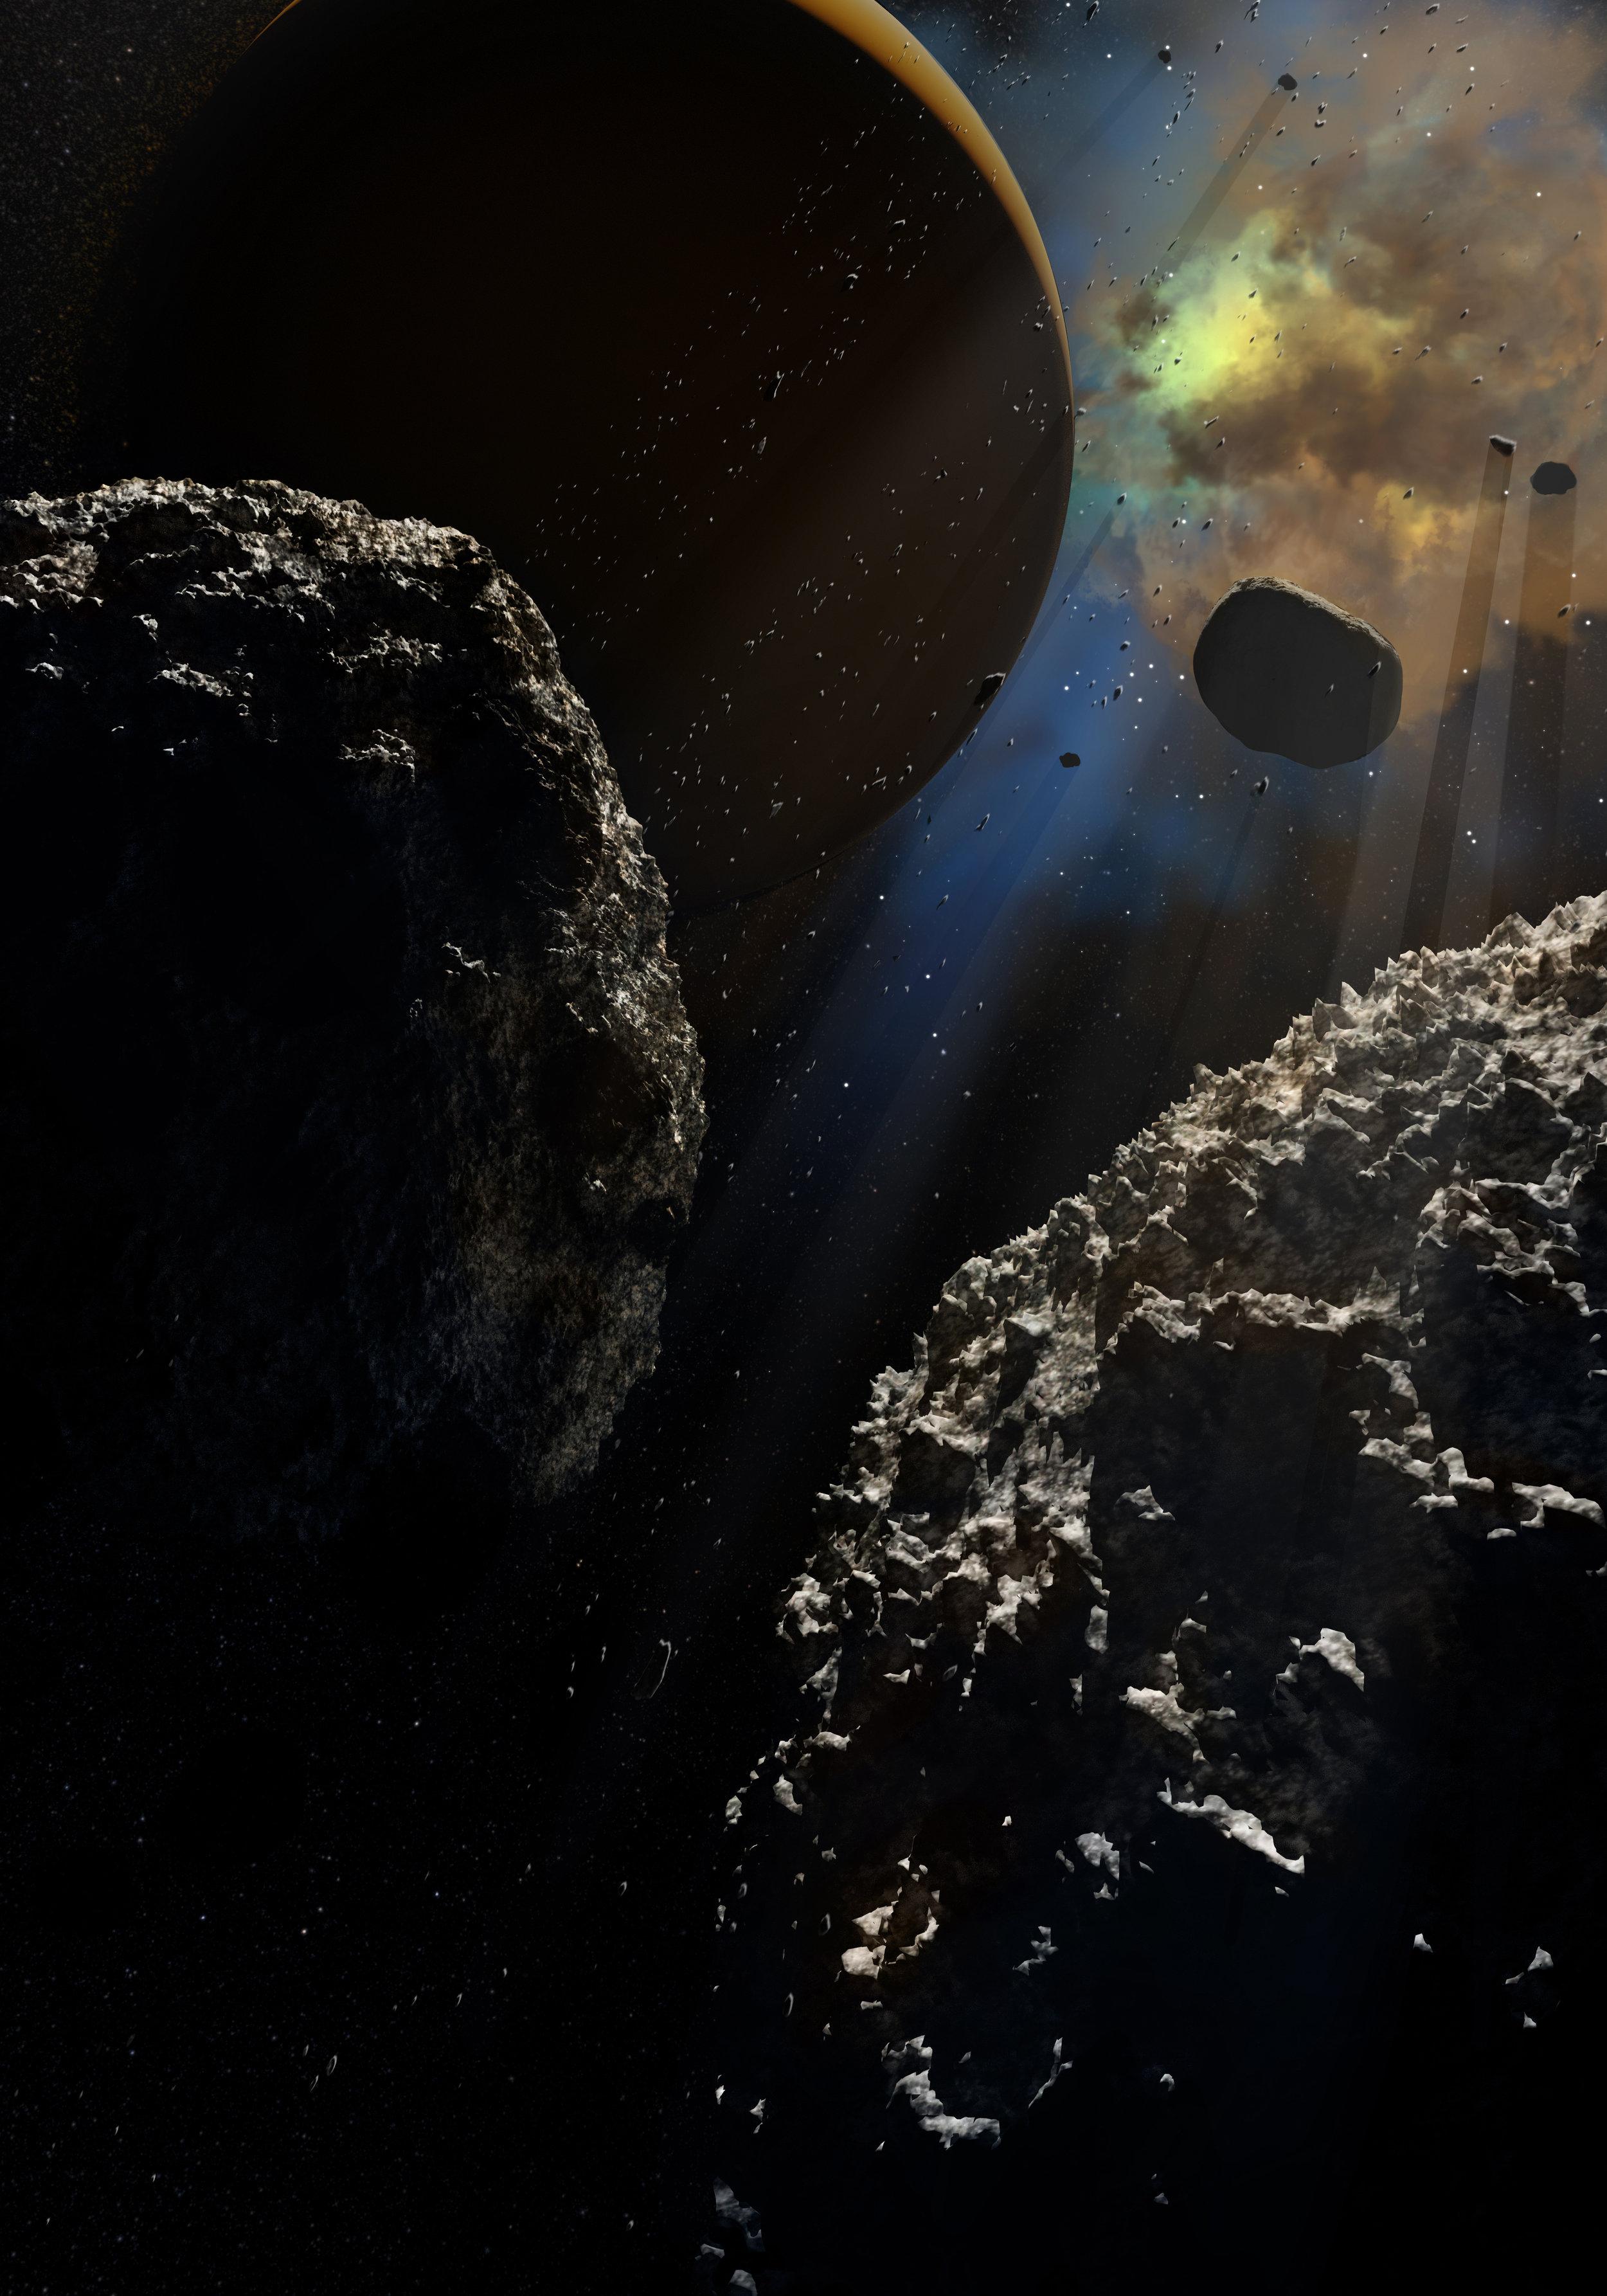 Exoplanet Ring Dance